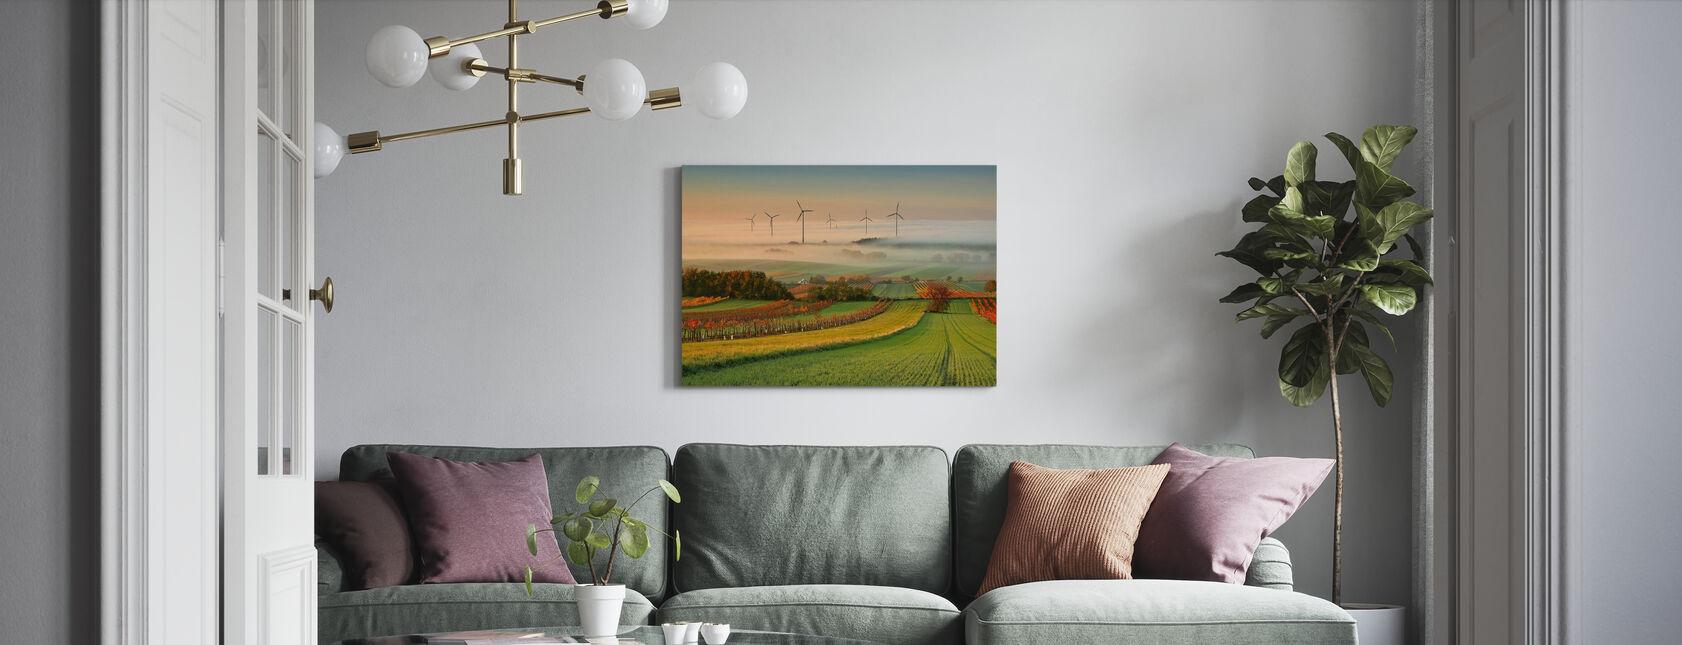 Autumn Atmosphere in Vineyards - Canvas print - Living Room